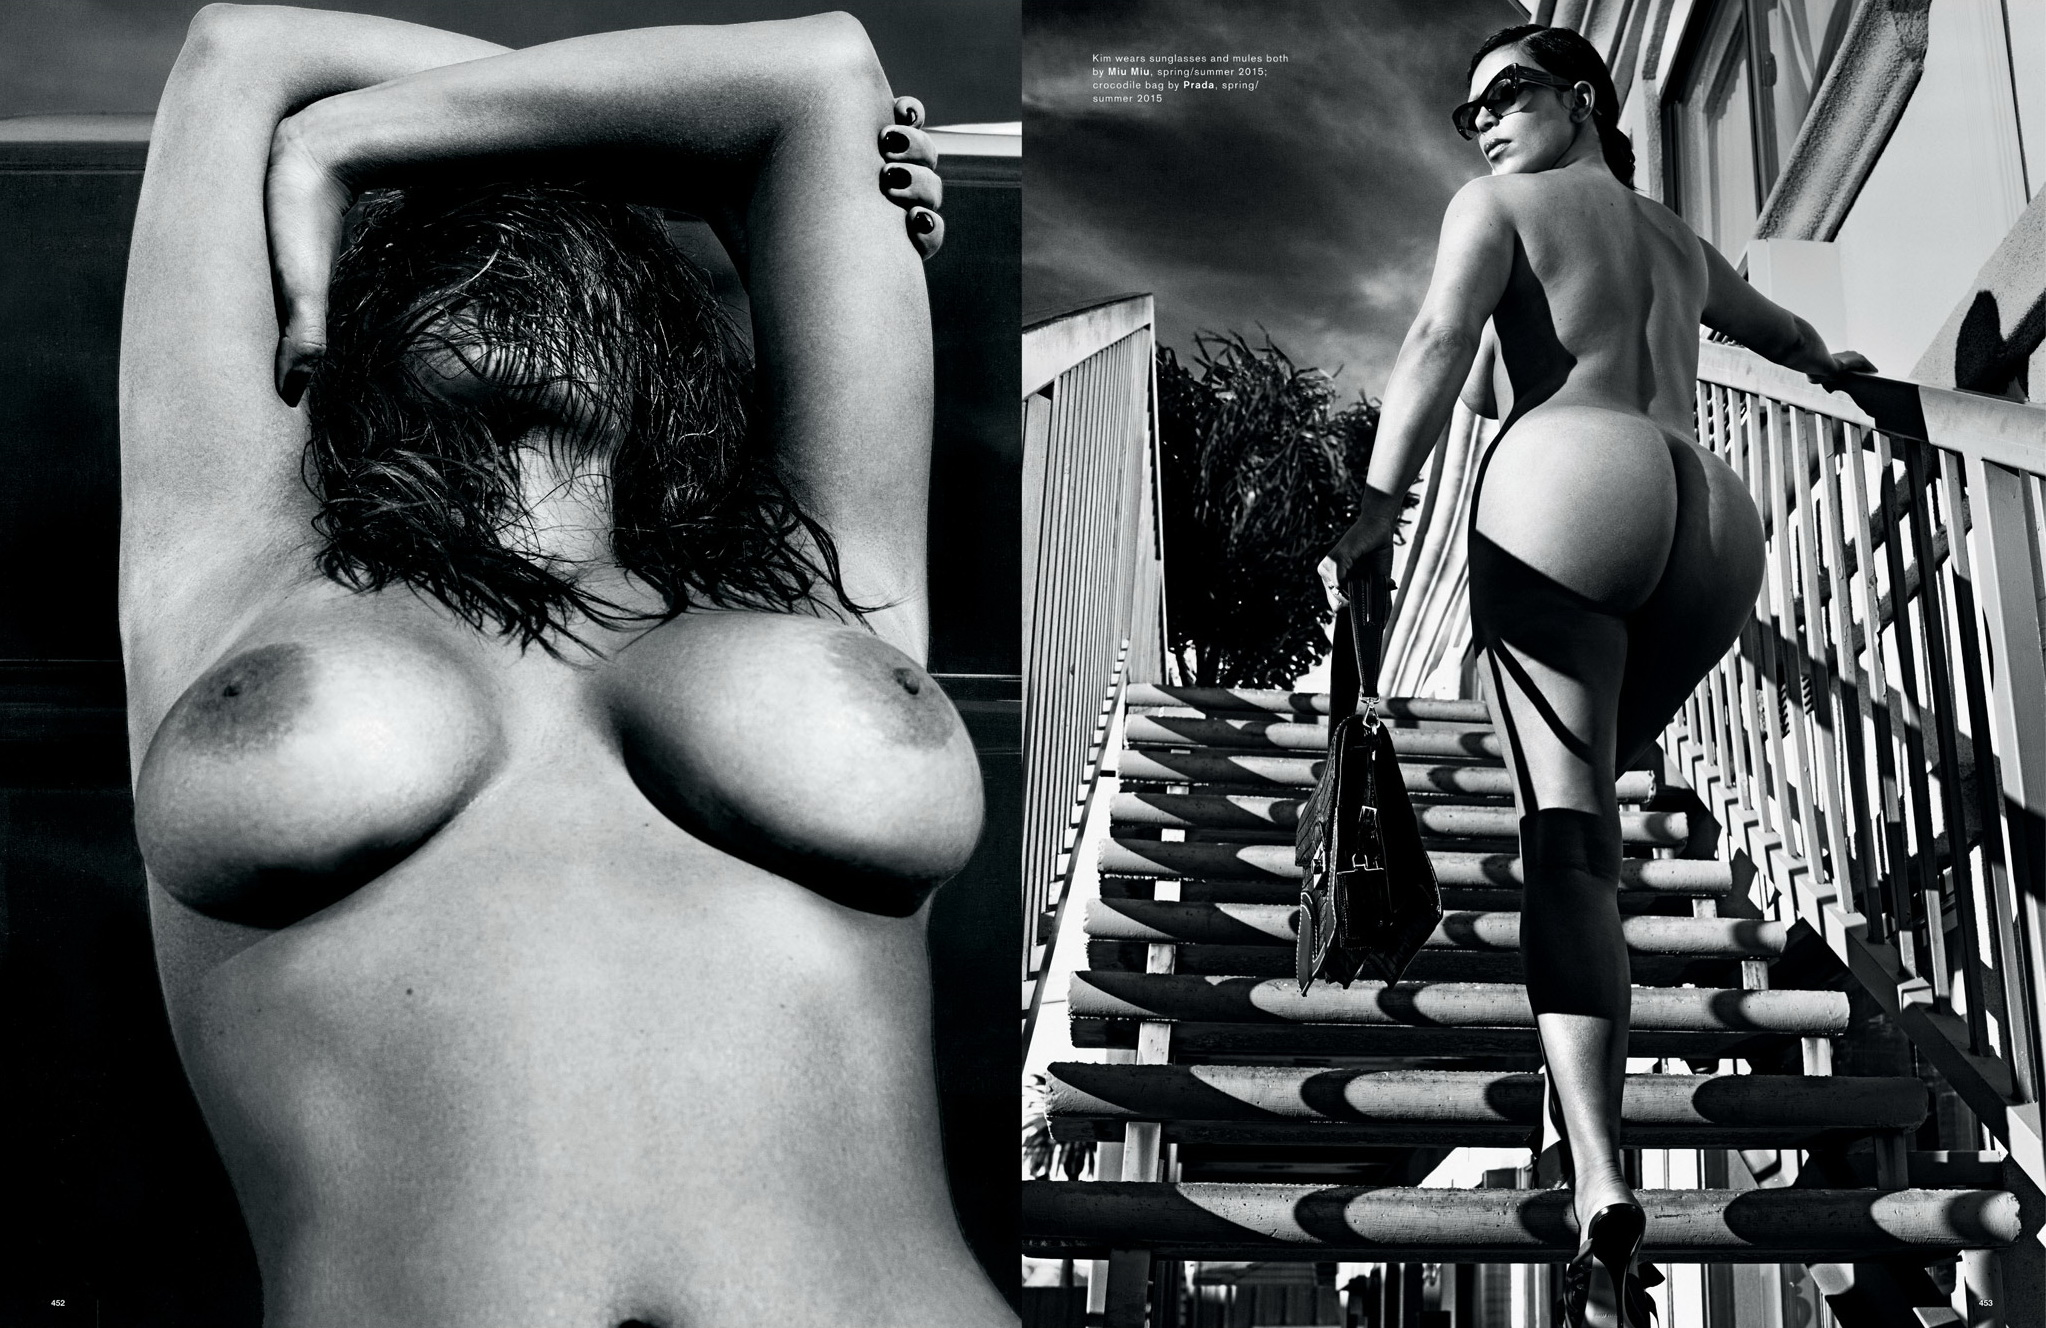 foto Kim kardashian naked 2 pics